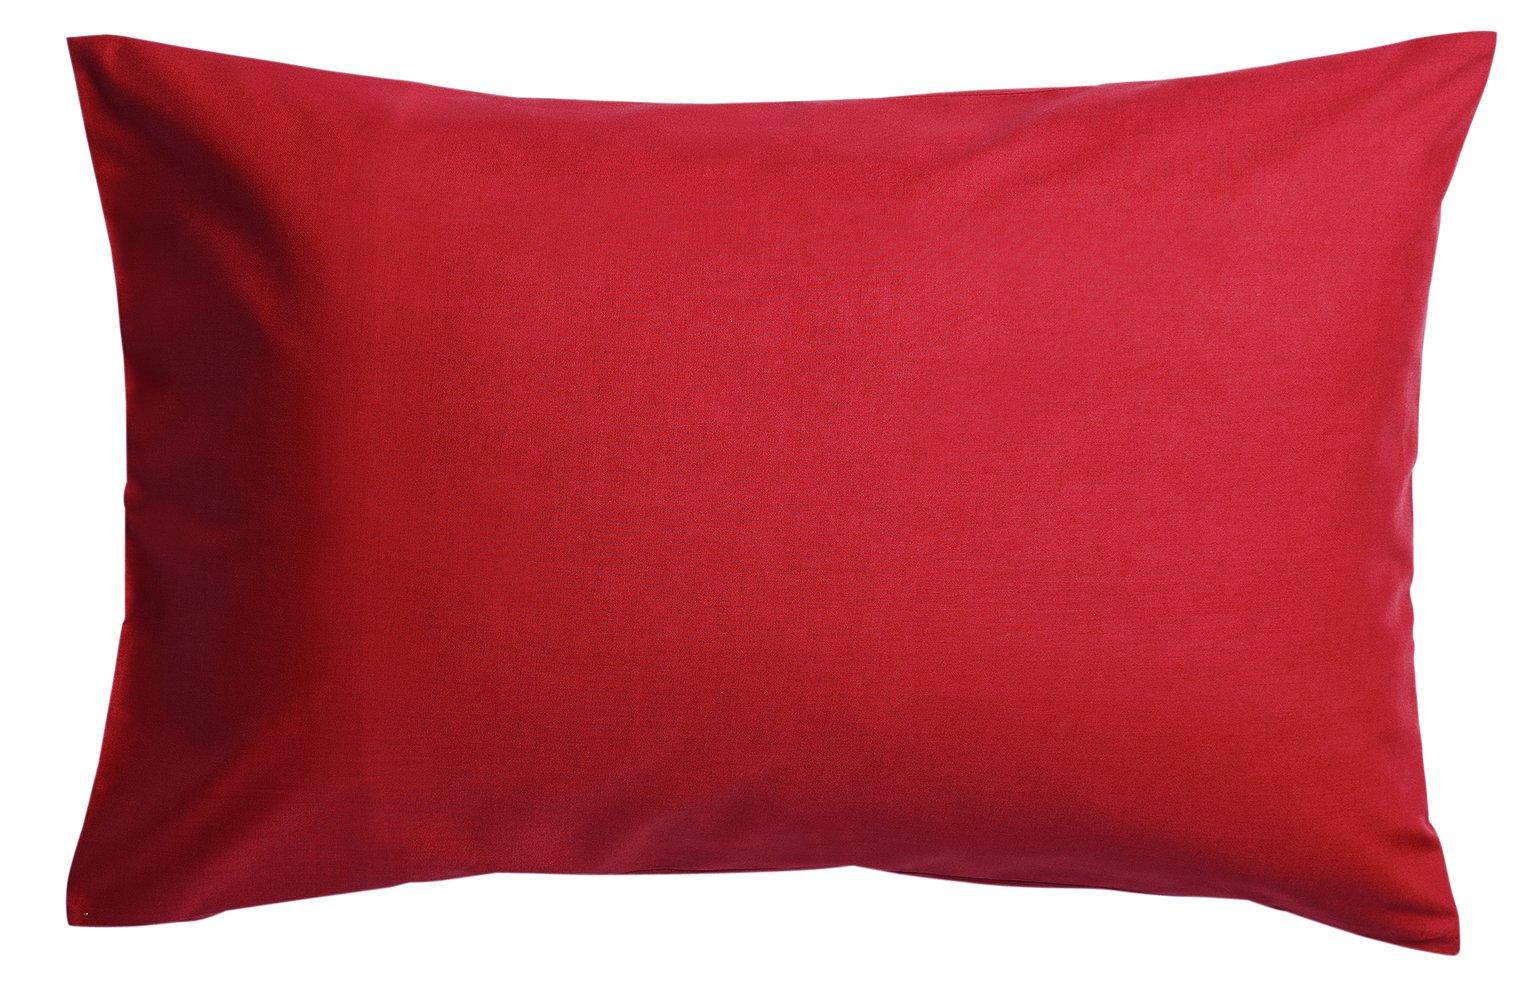 Argos Home Easycare Polycotton Standard Pillowcase Pair